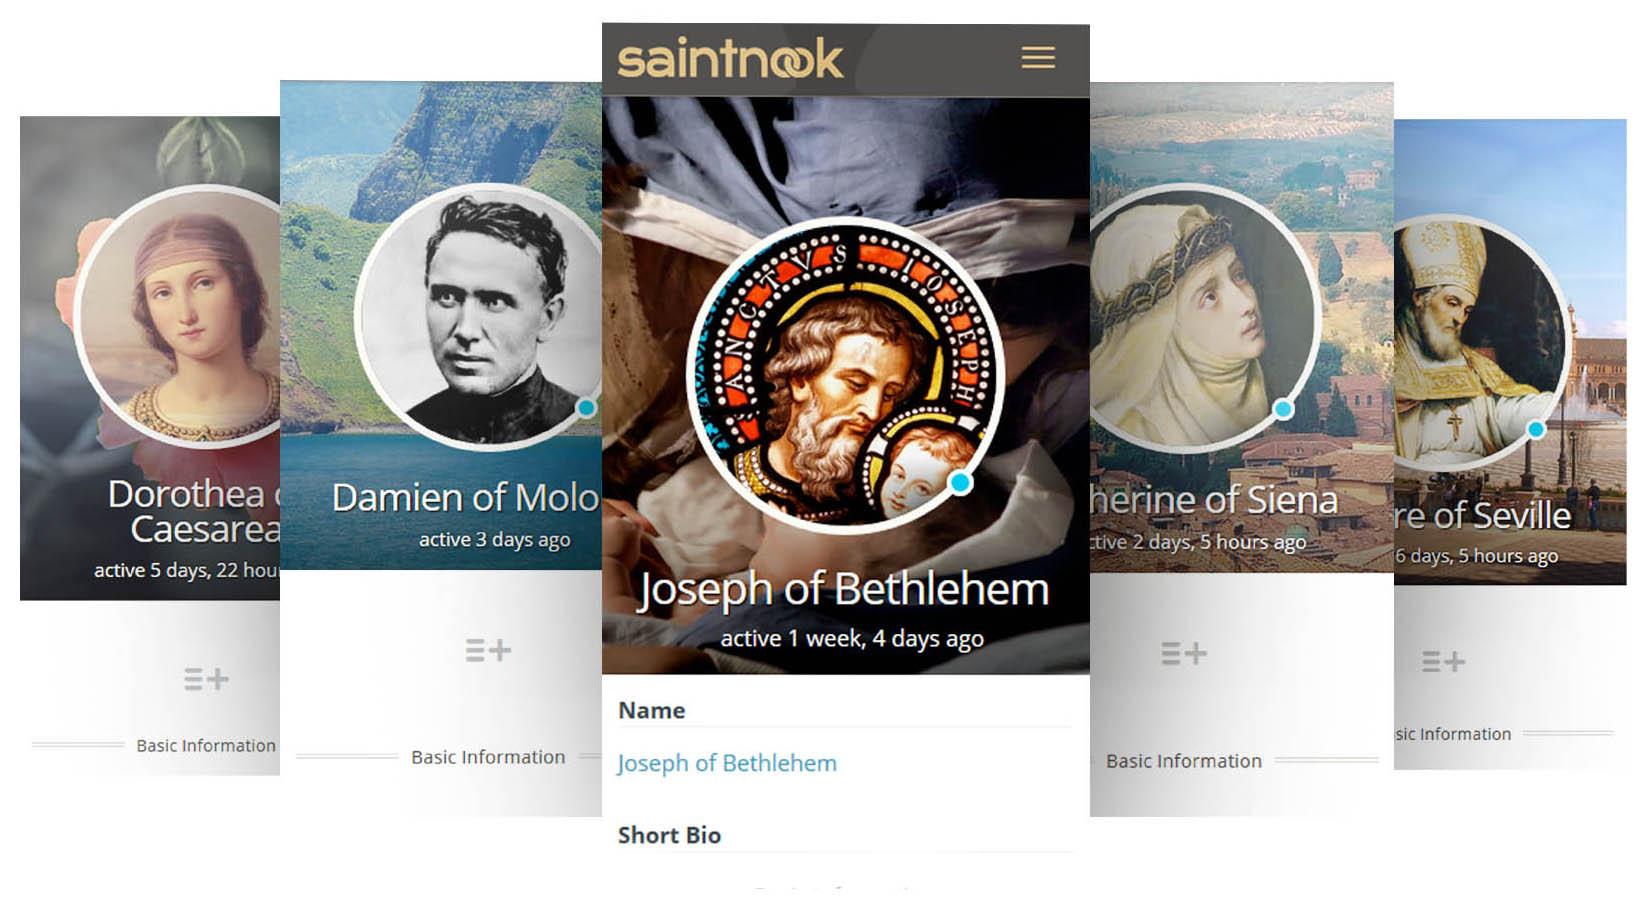 Saintnook: A Social Network